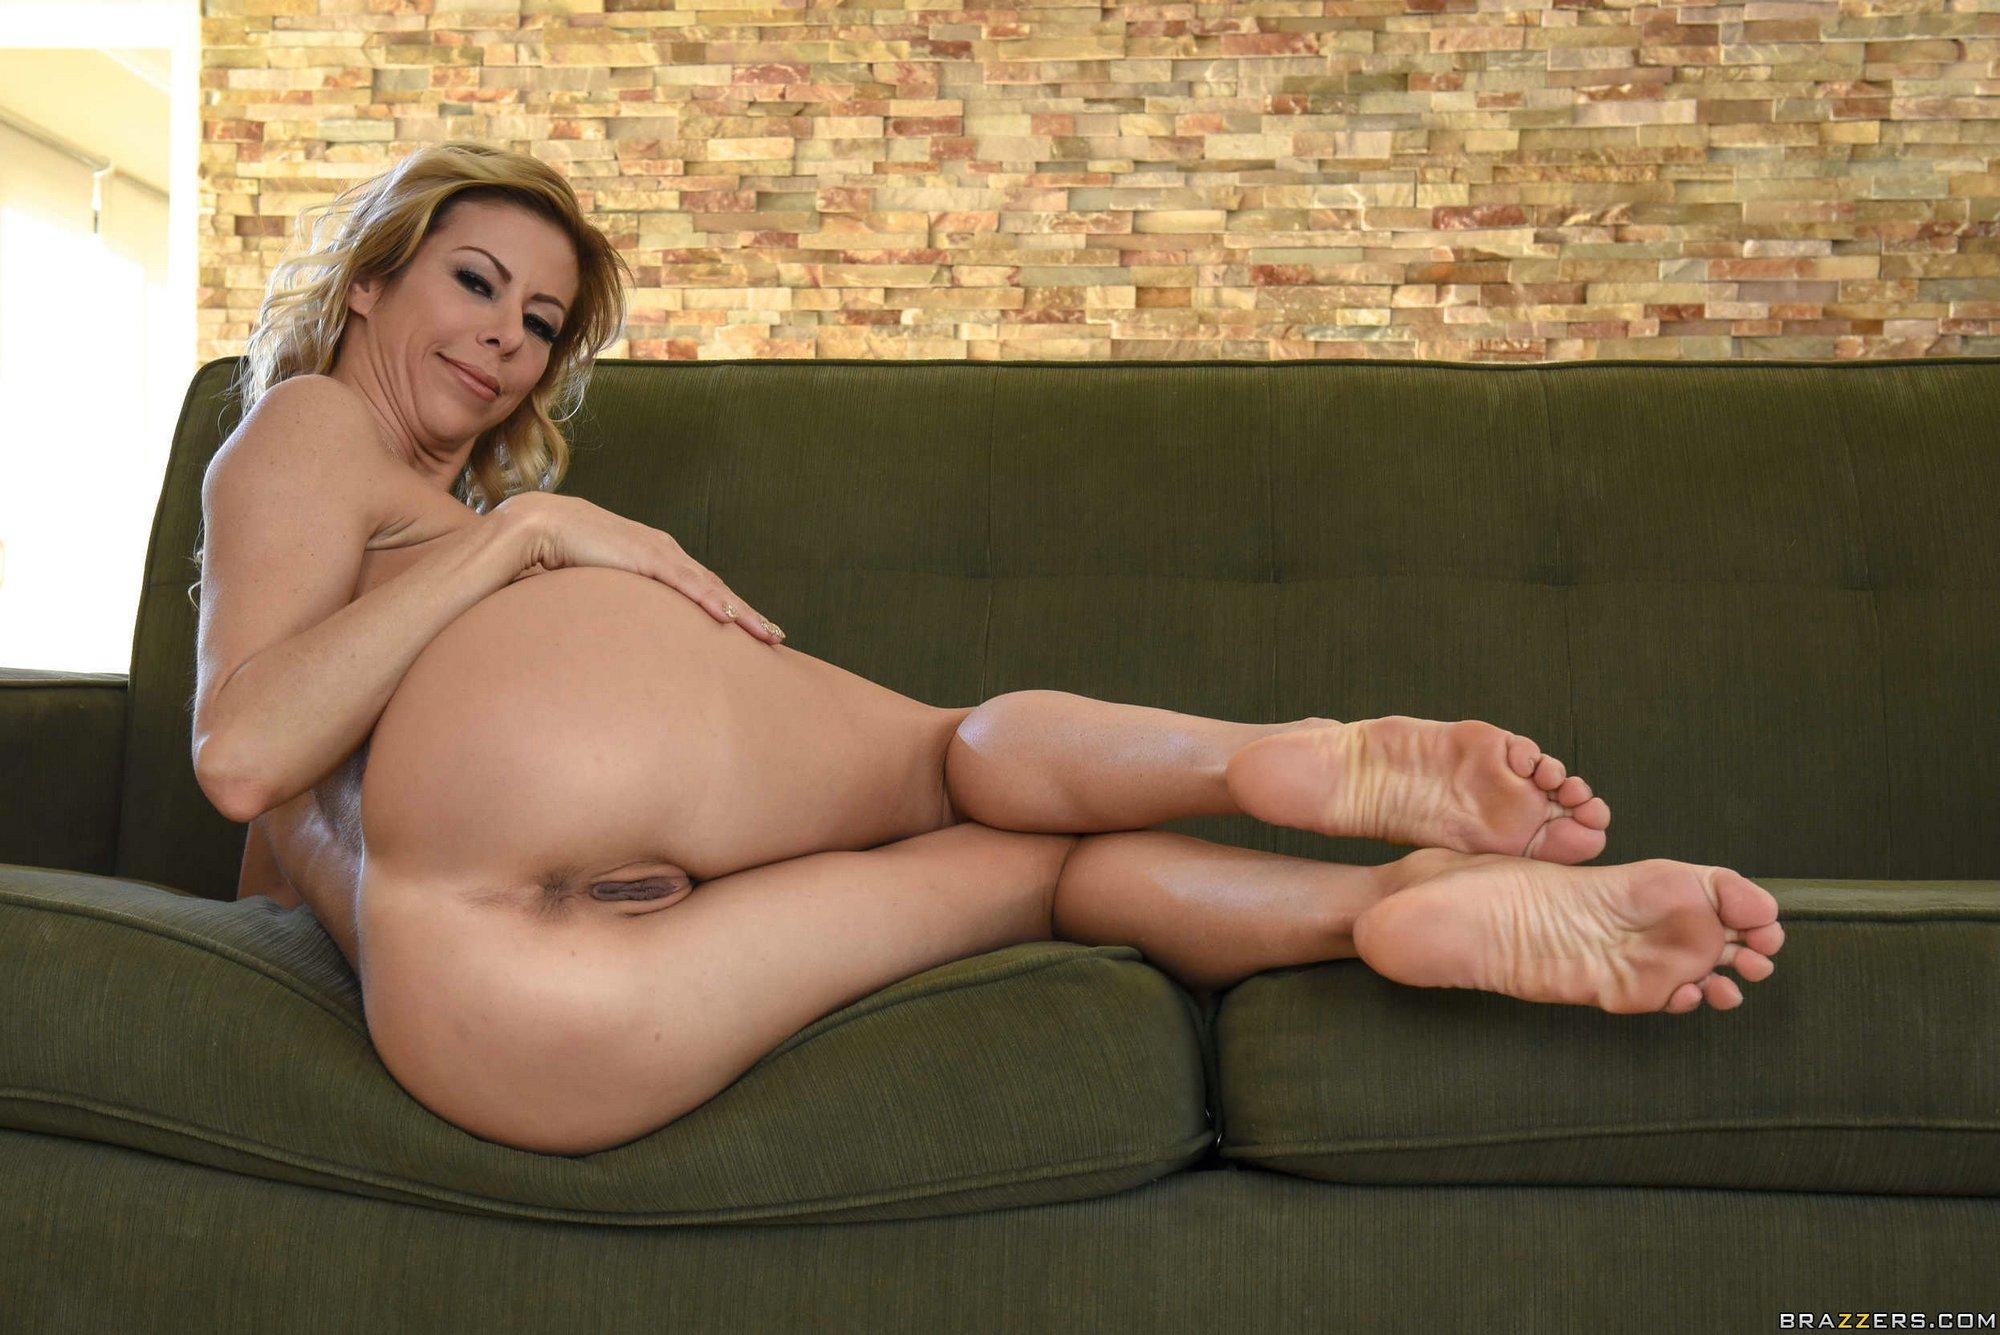 Alexis fawx feet porn